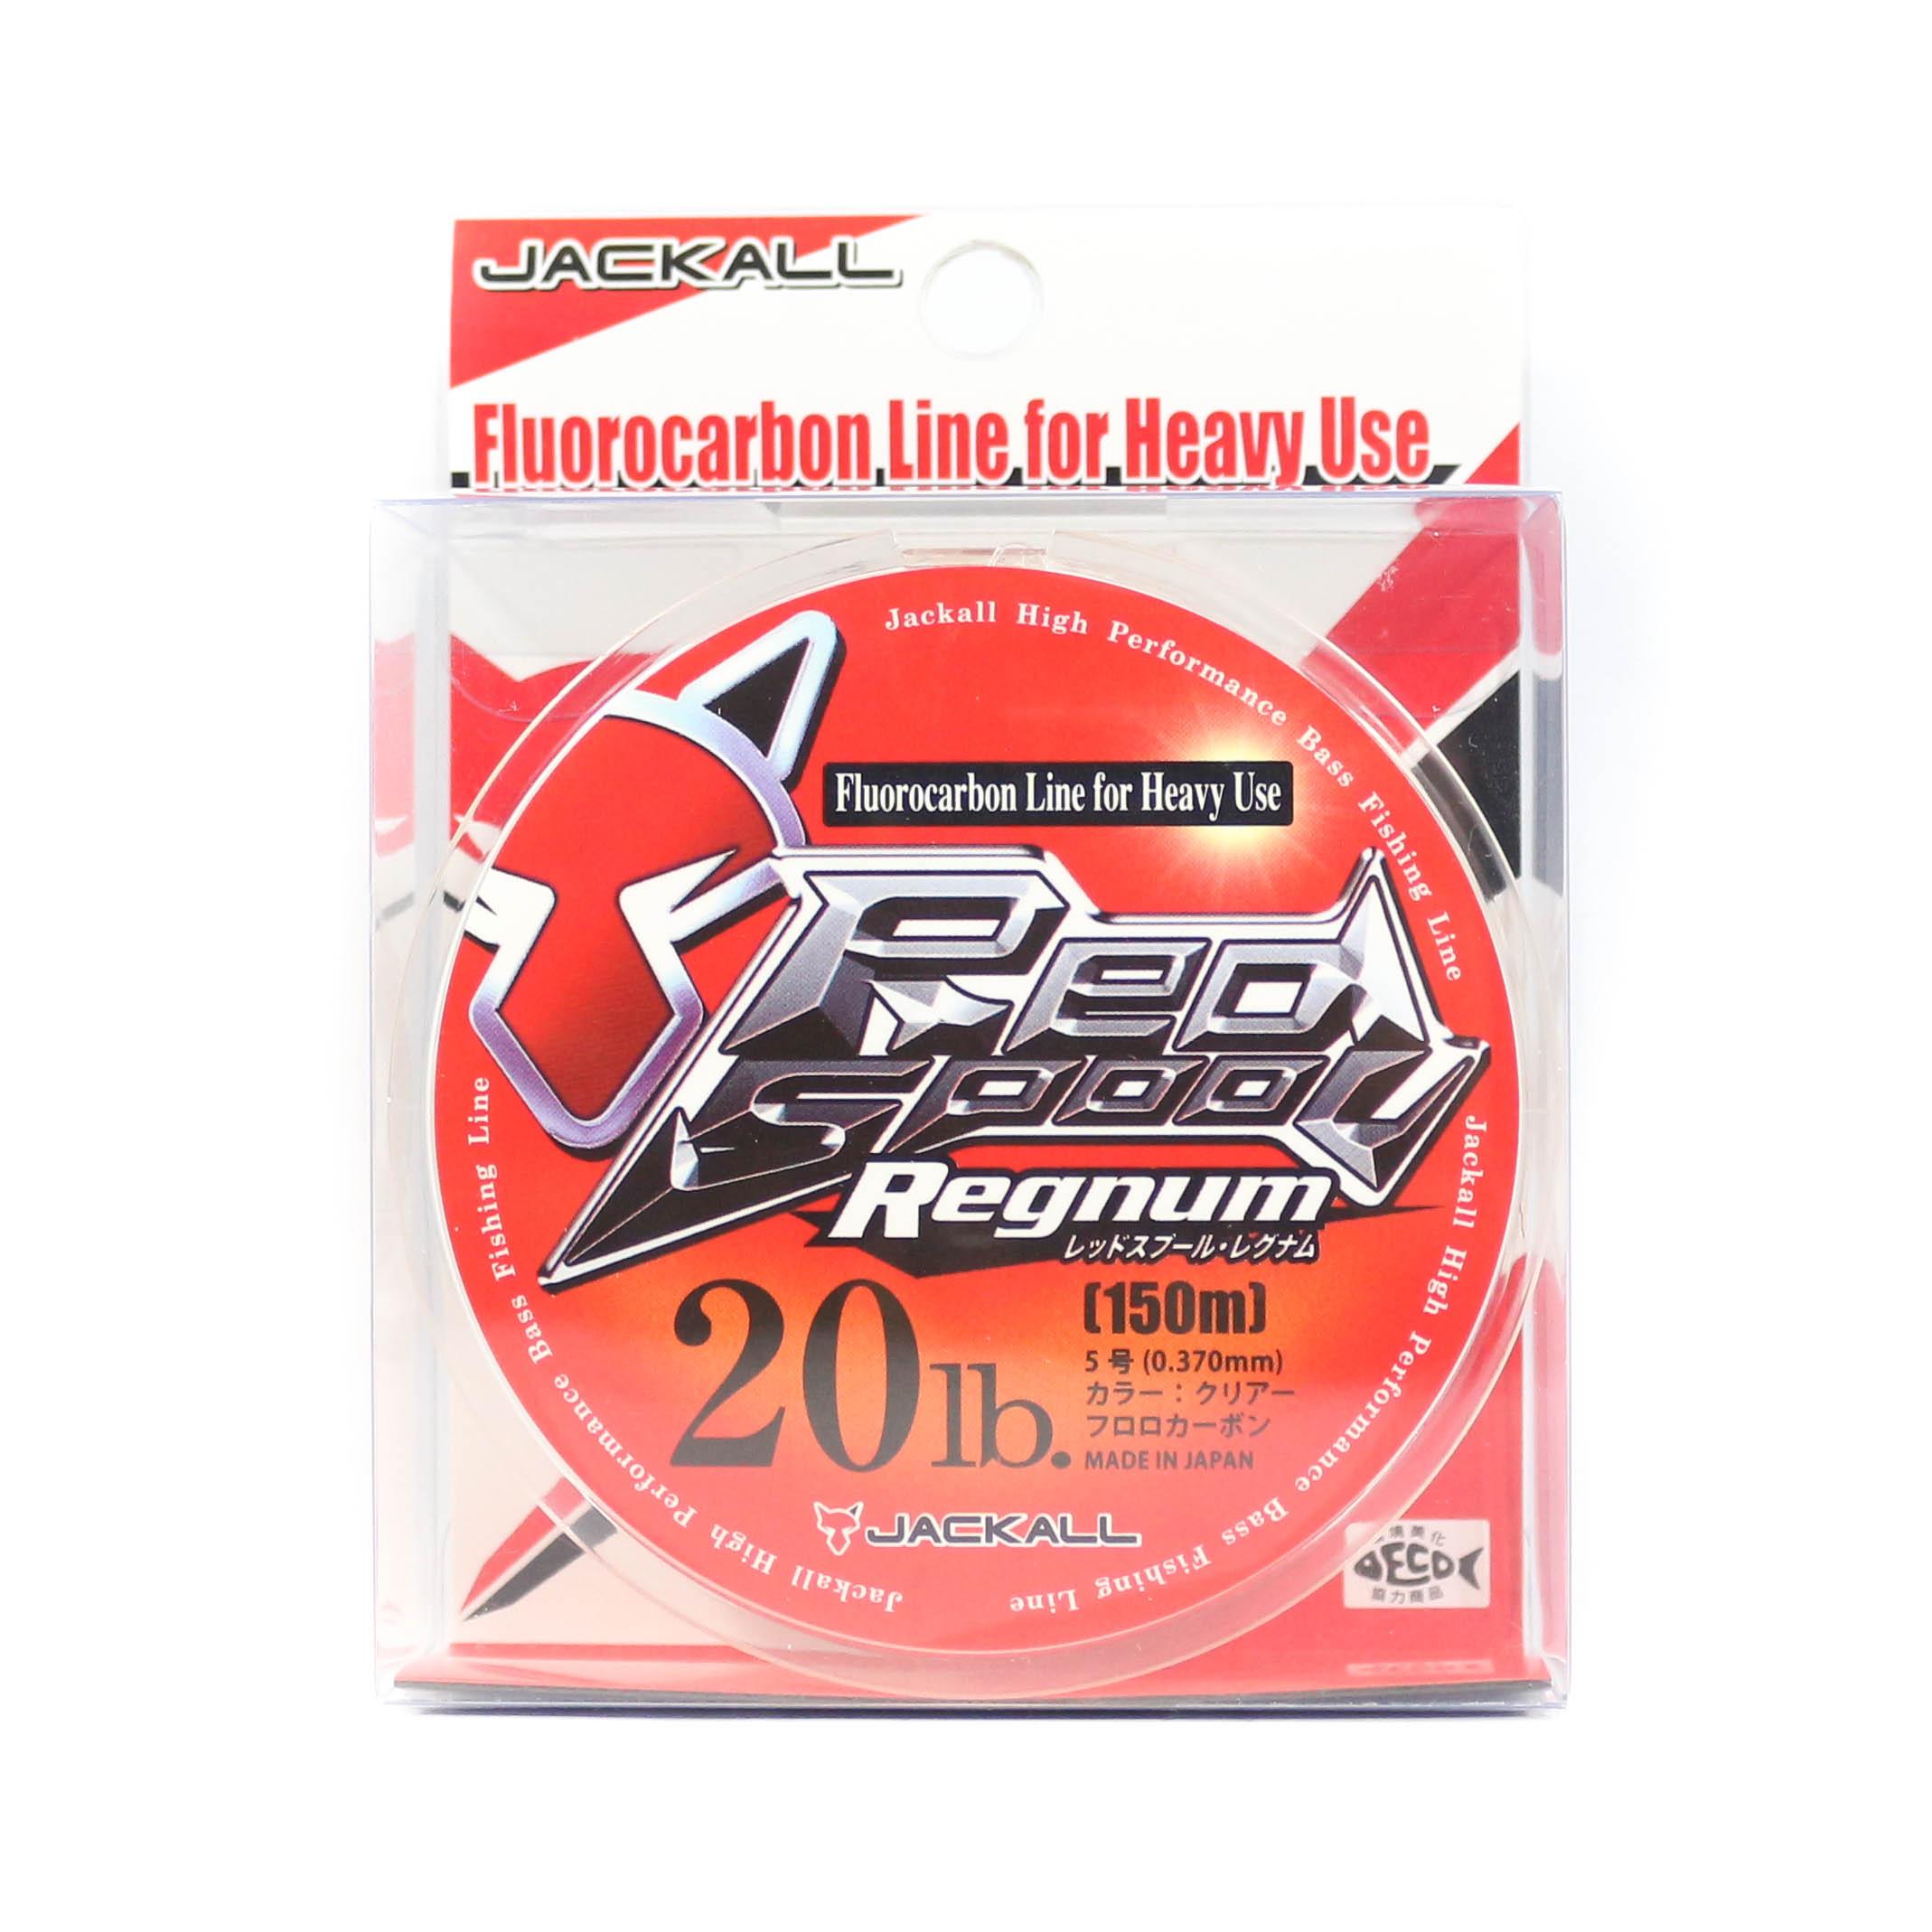 Jackall Fluorocarbon Line Red Spool Regnum 20lb x 150m (5203)